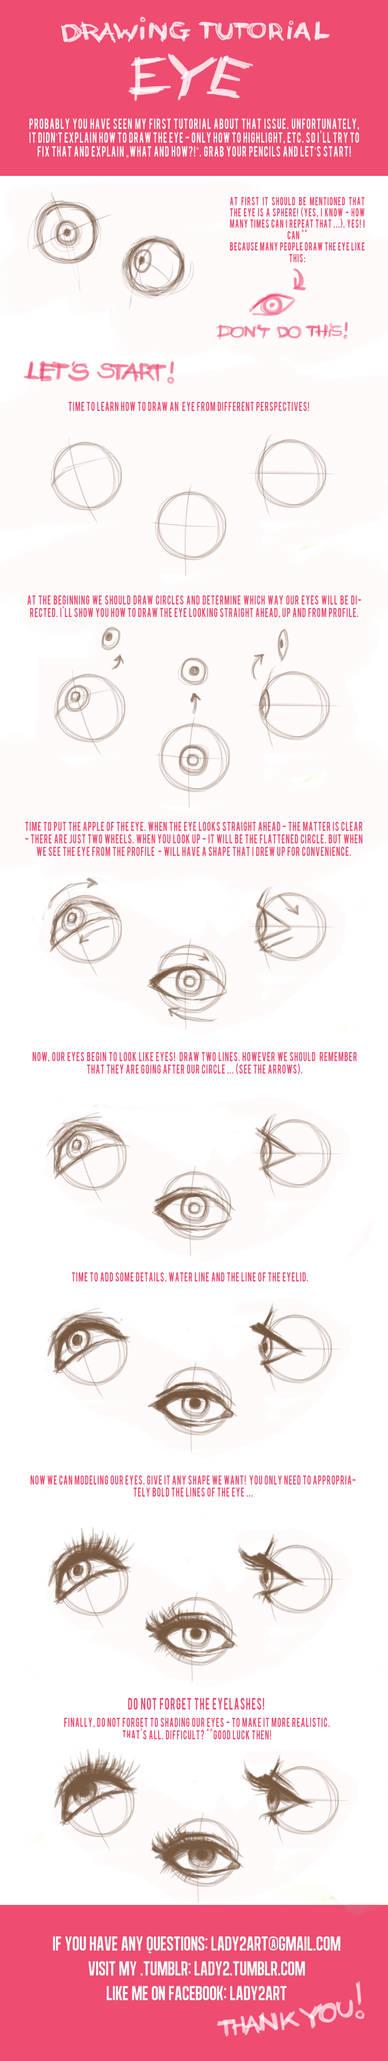 eye_tutorial.